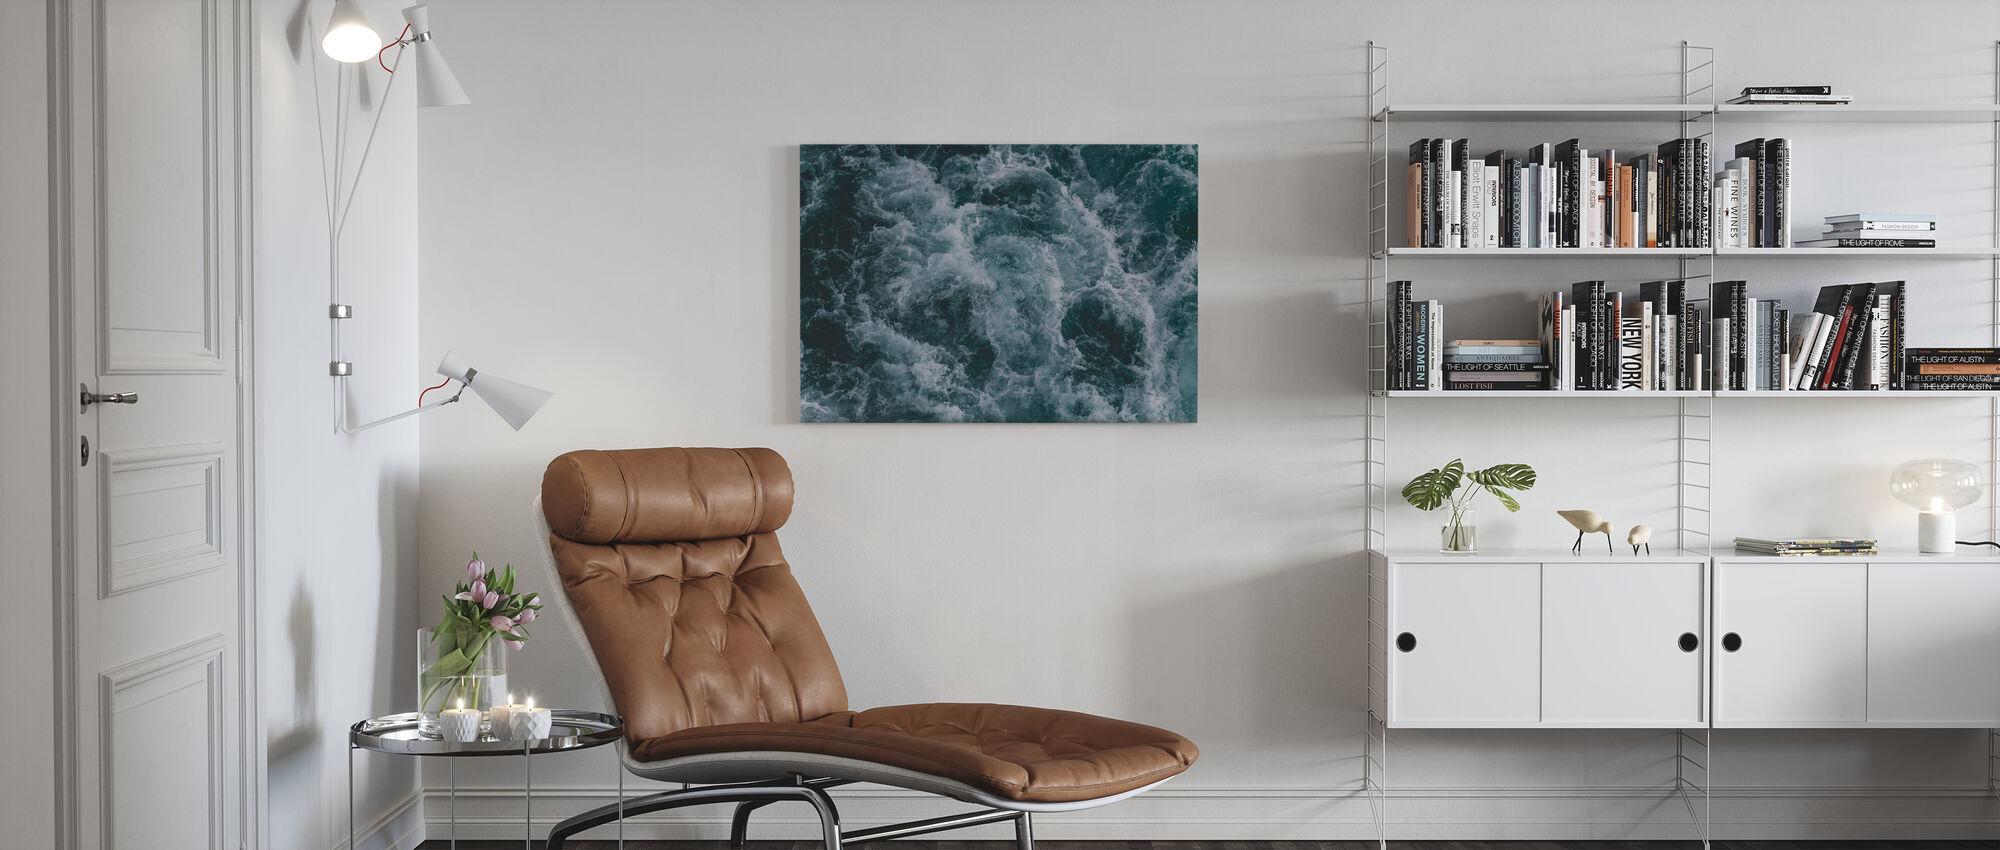 Koud en stormachtig - Canvas print - Woonkamer